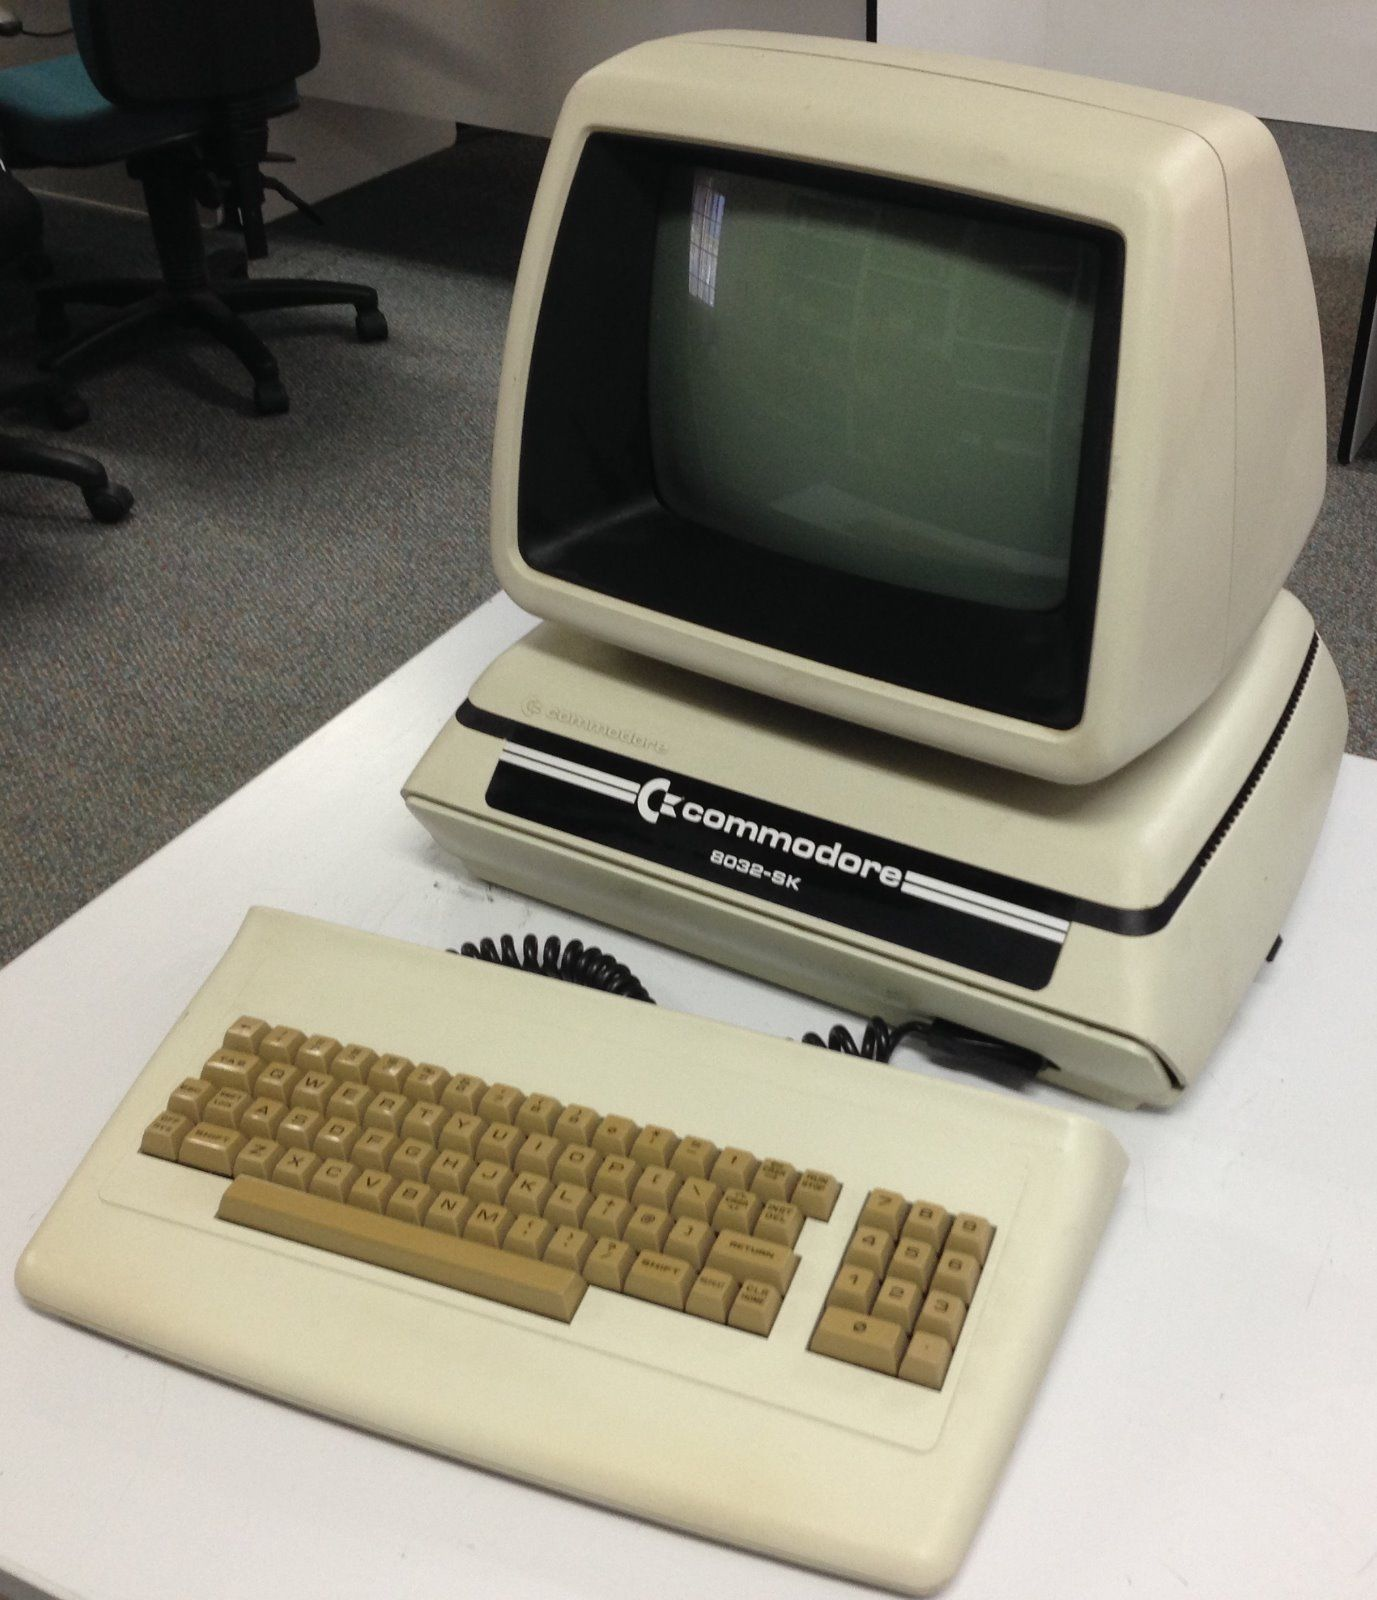 Antique Commodore Business Machine BCM 8032 SK 1981 82